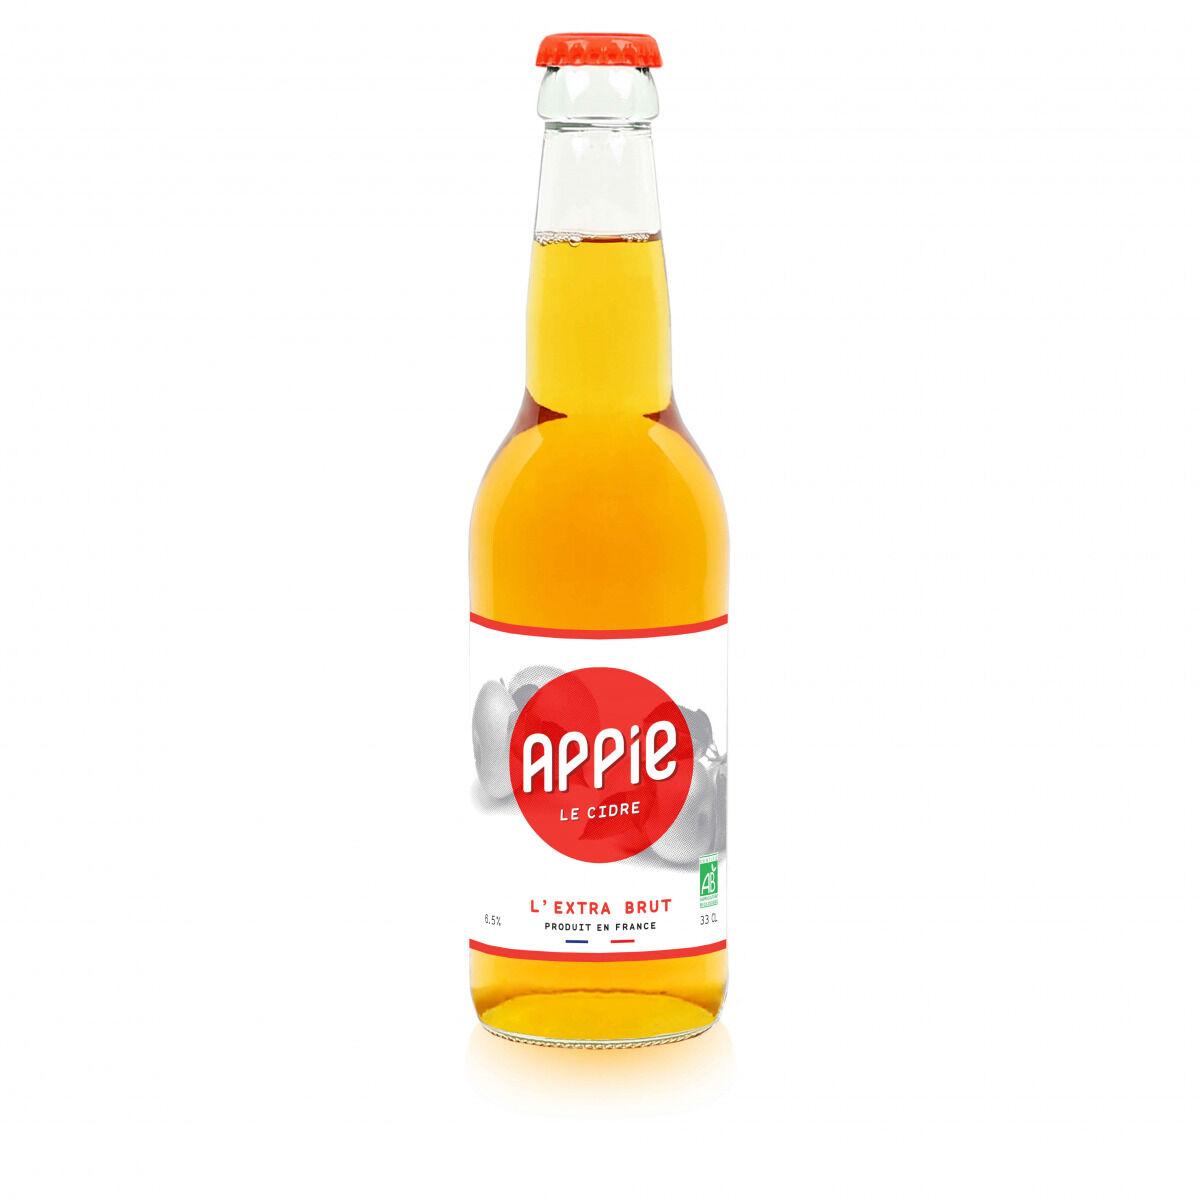 Appie Cidre Extra Brut Bio Appie 12x33cl